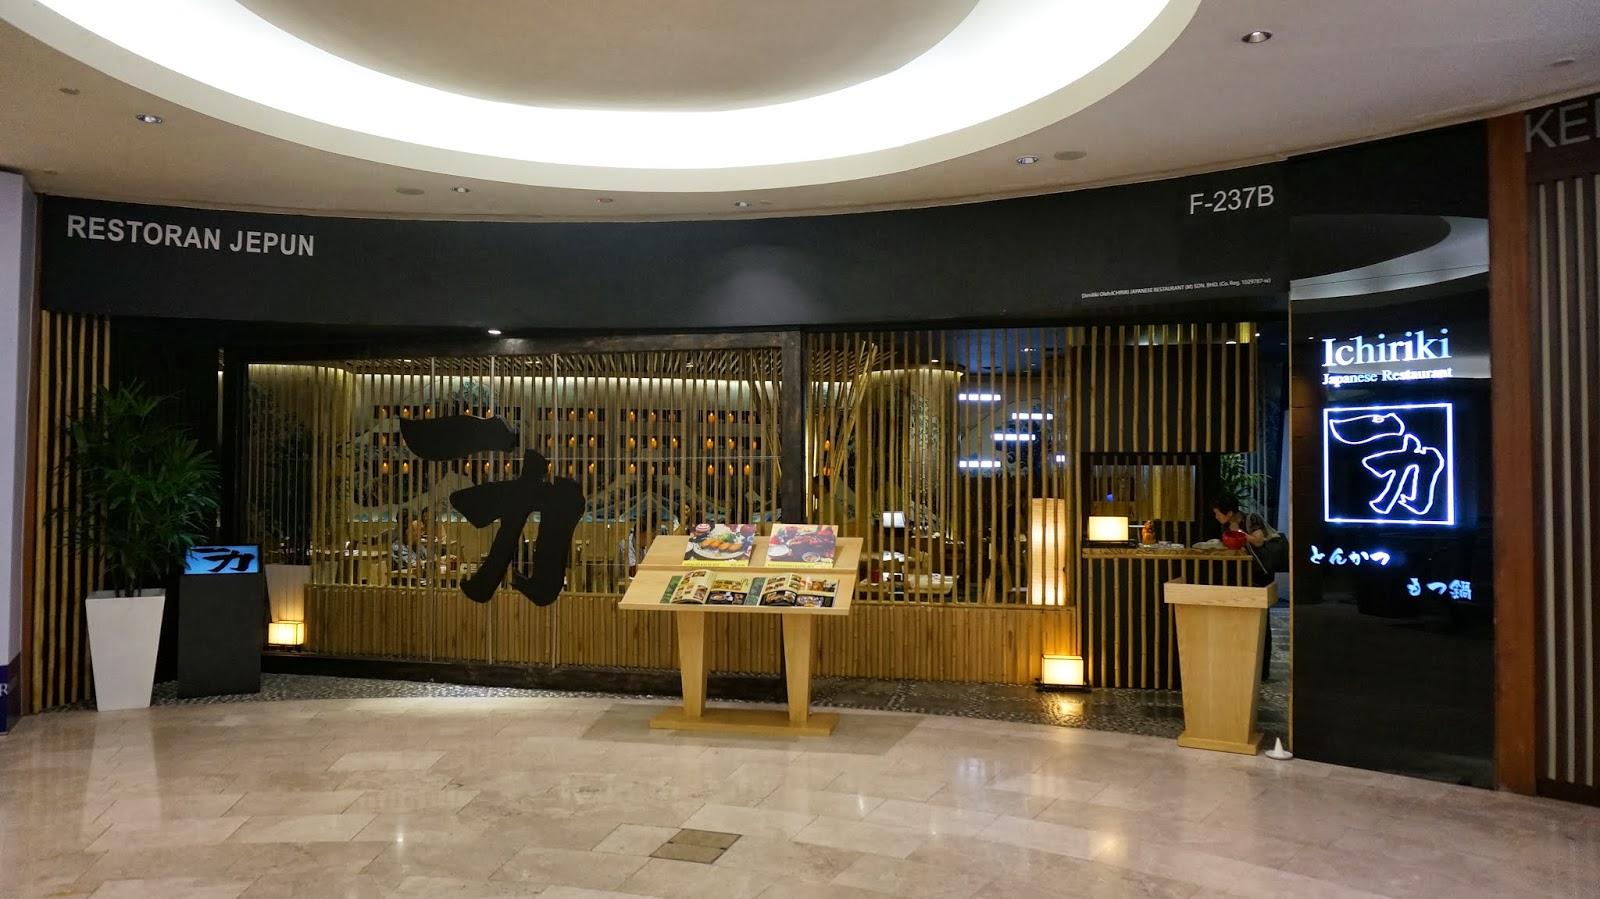 Restaurant Foyer Design : Ichiriki japanese restaurant the gardens mall dmz